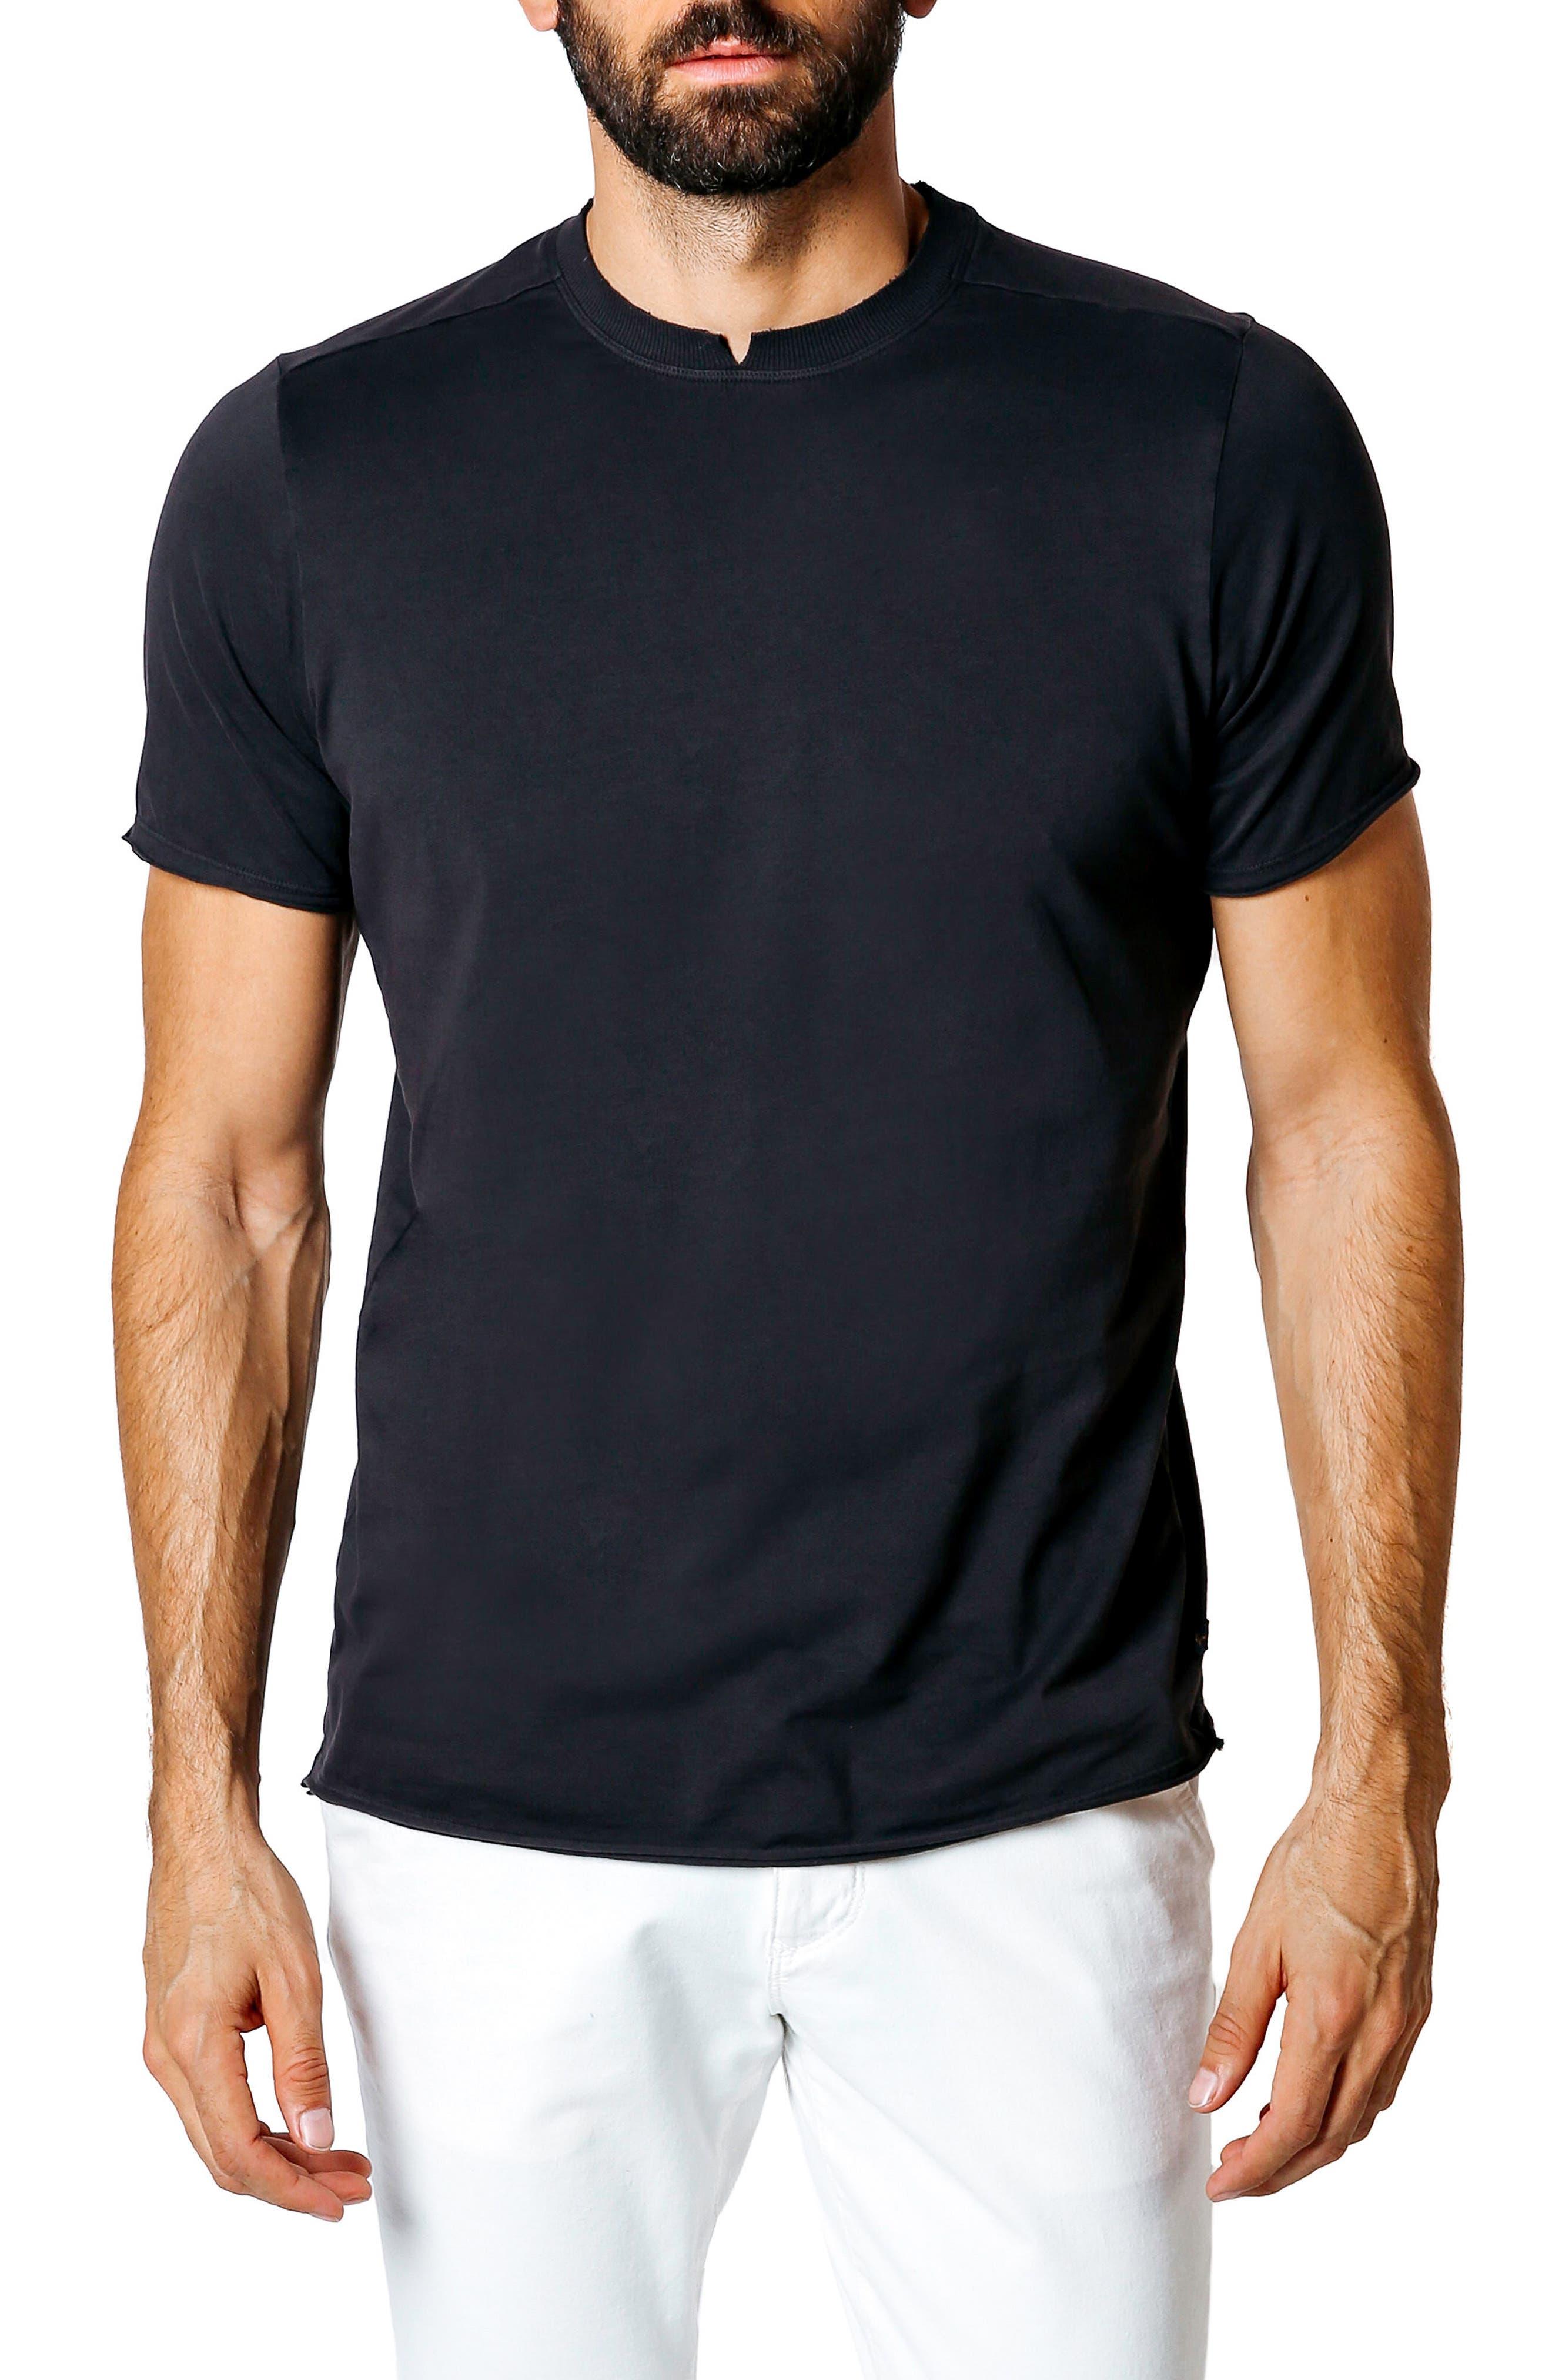 Trim Fit Slub T-Shirt,                             Main thumbnail 1, color,                             001